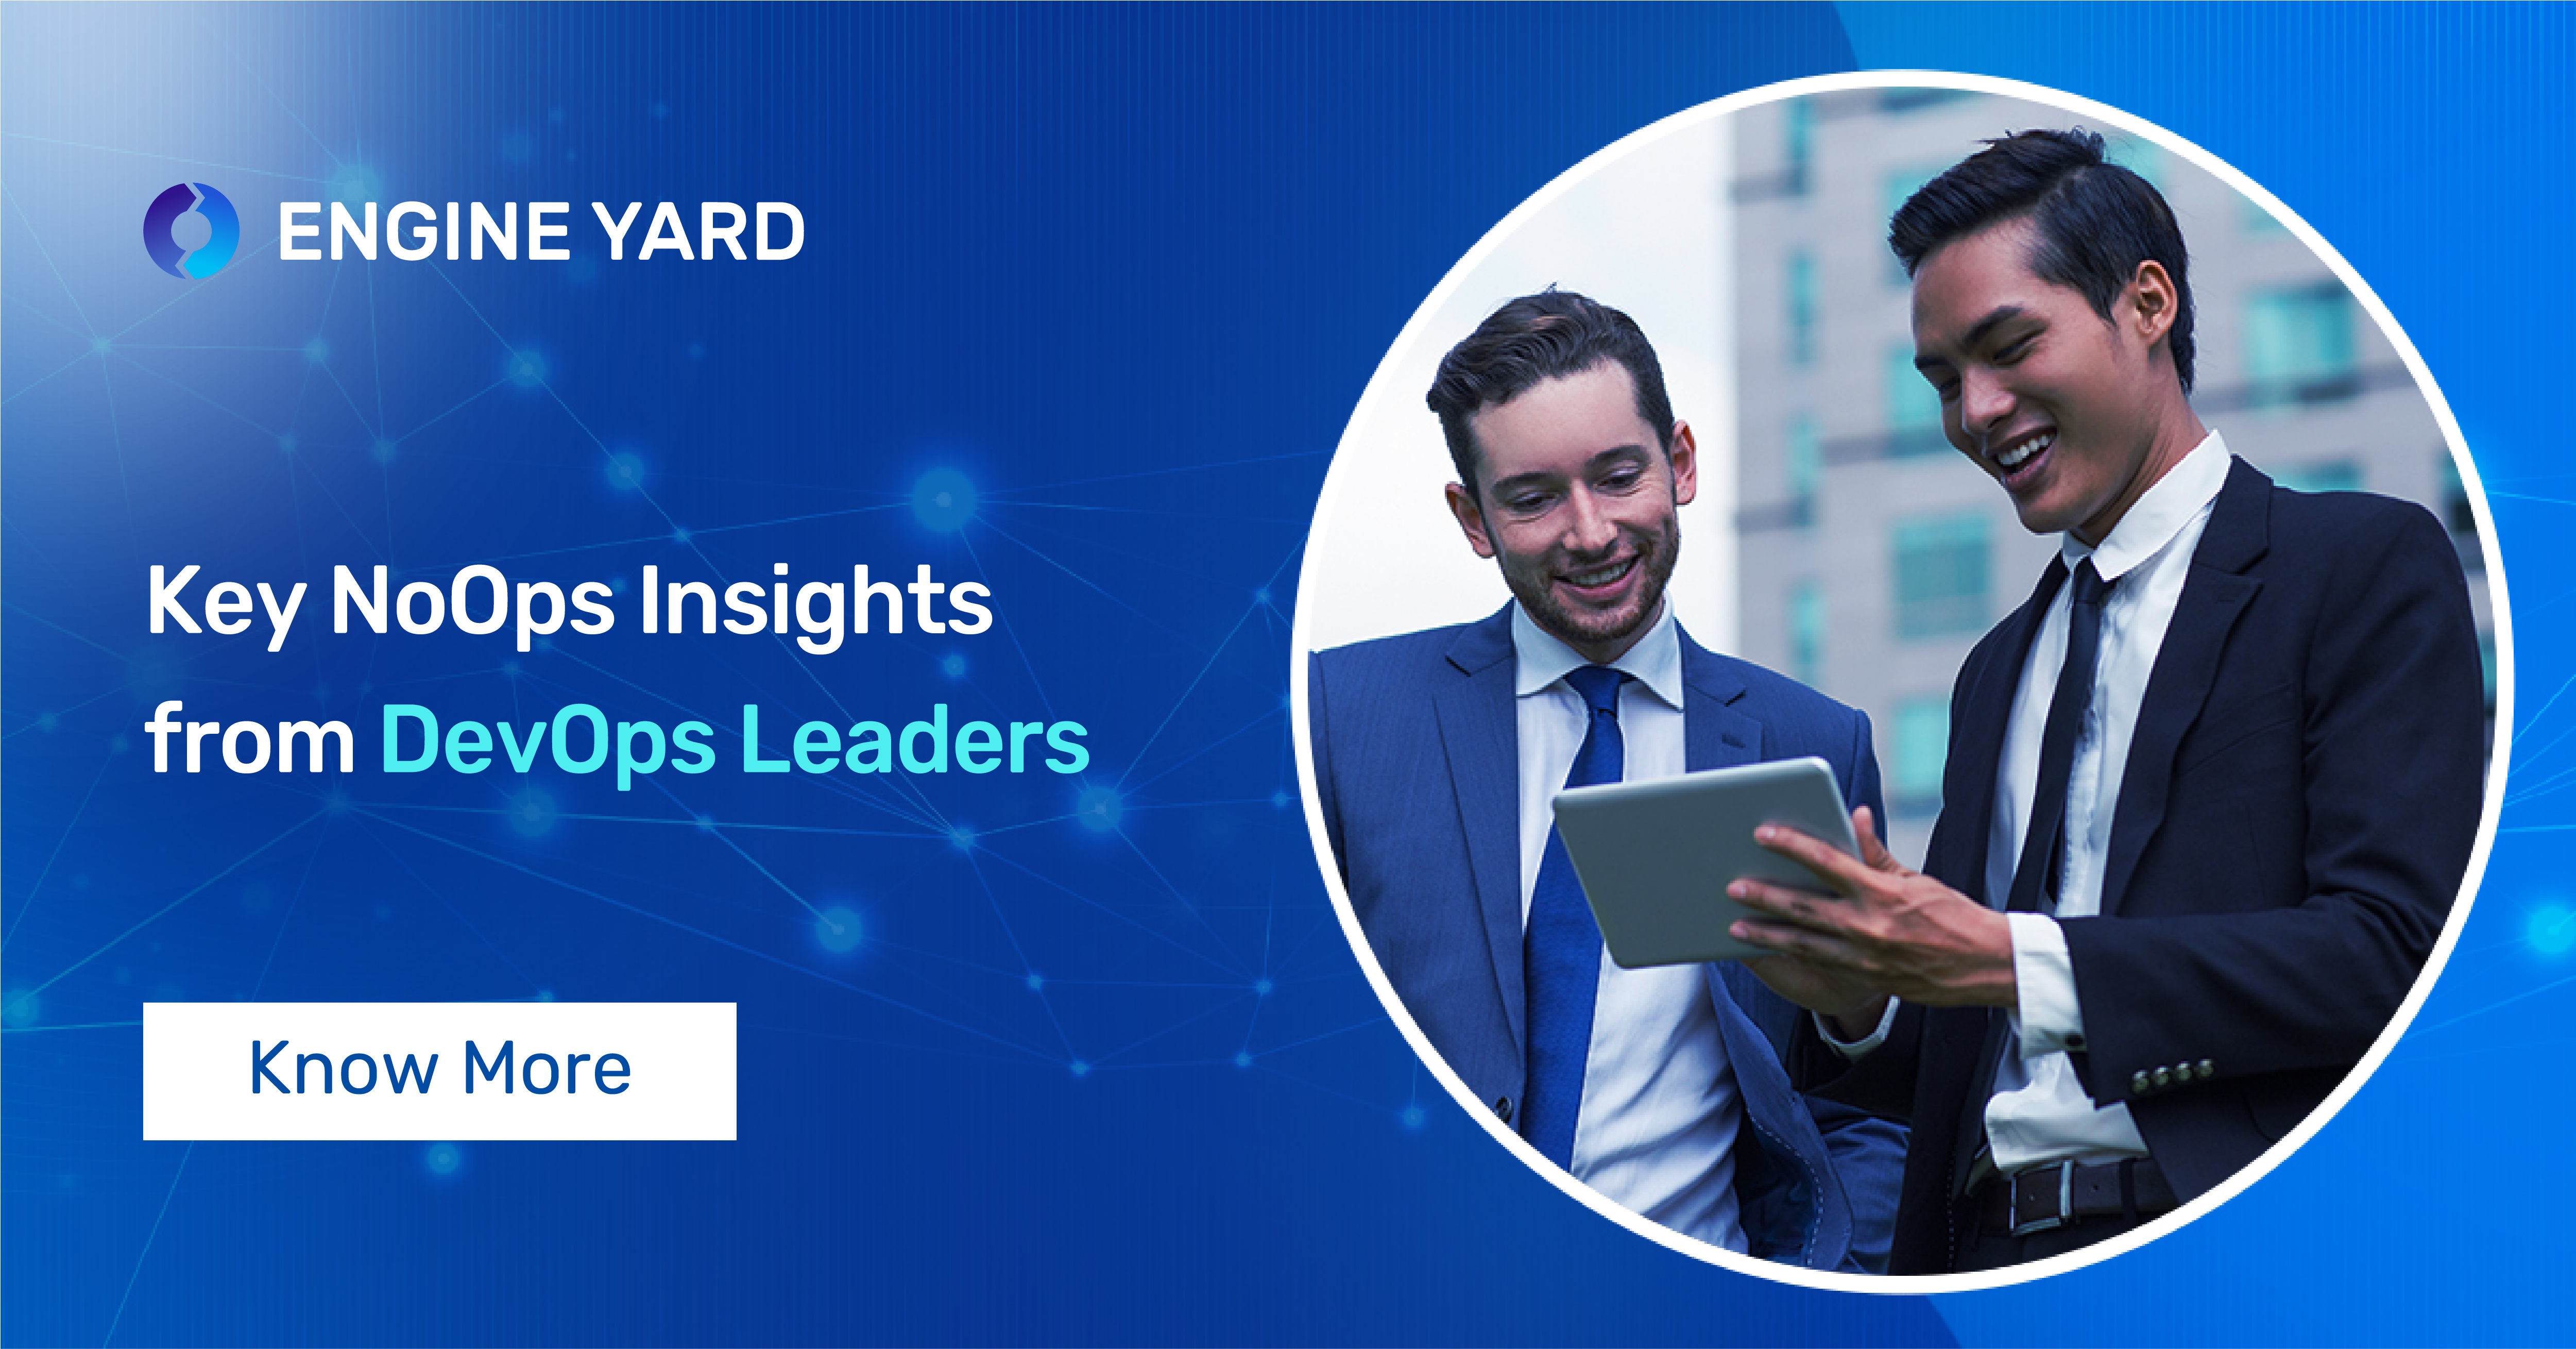 NoOps Insights From DevOps Leaders